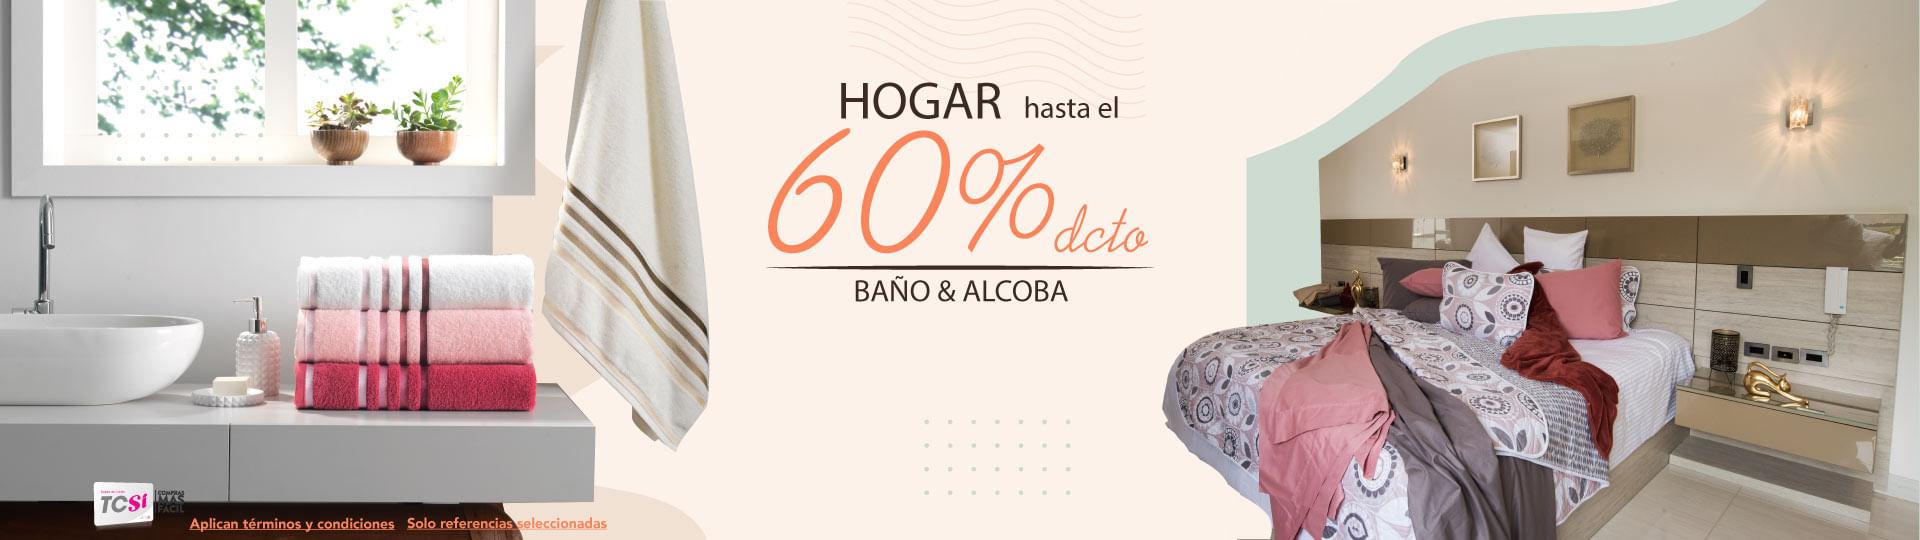 Hogar - Almacenes Si